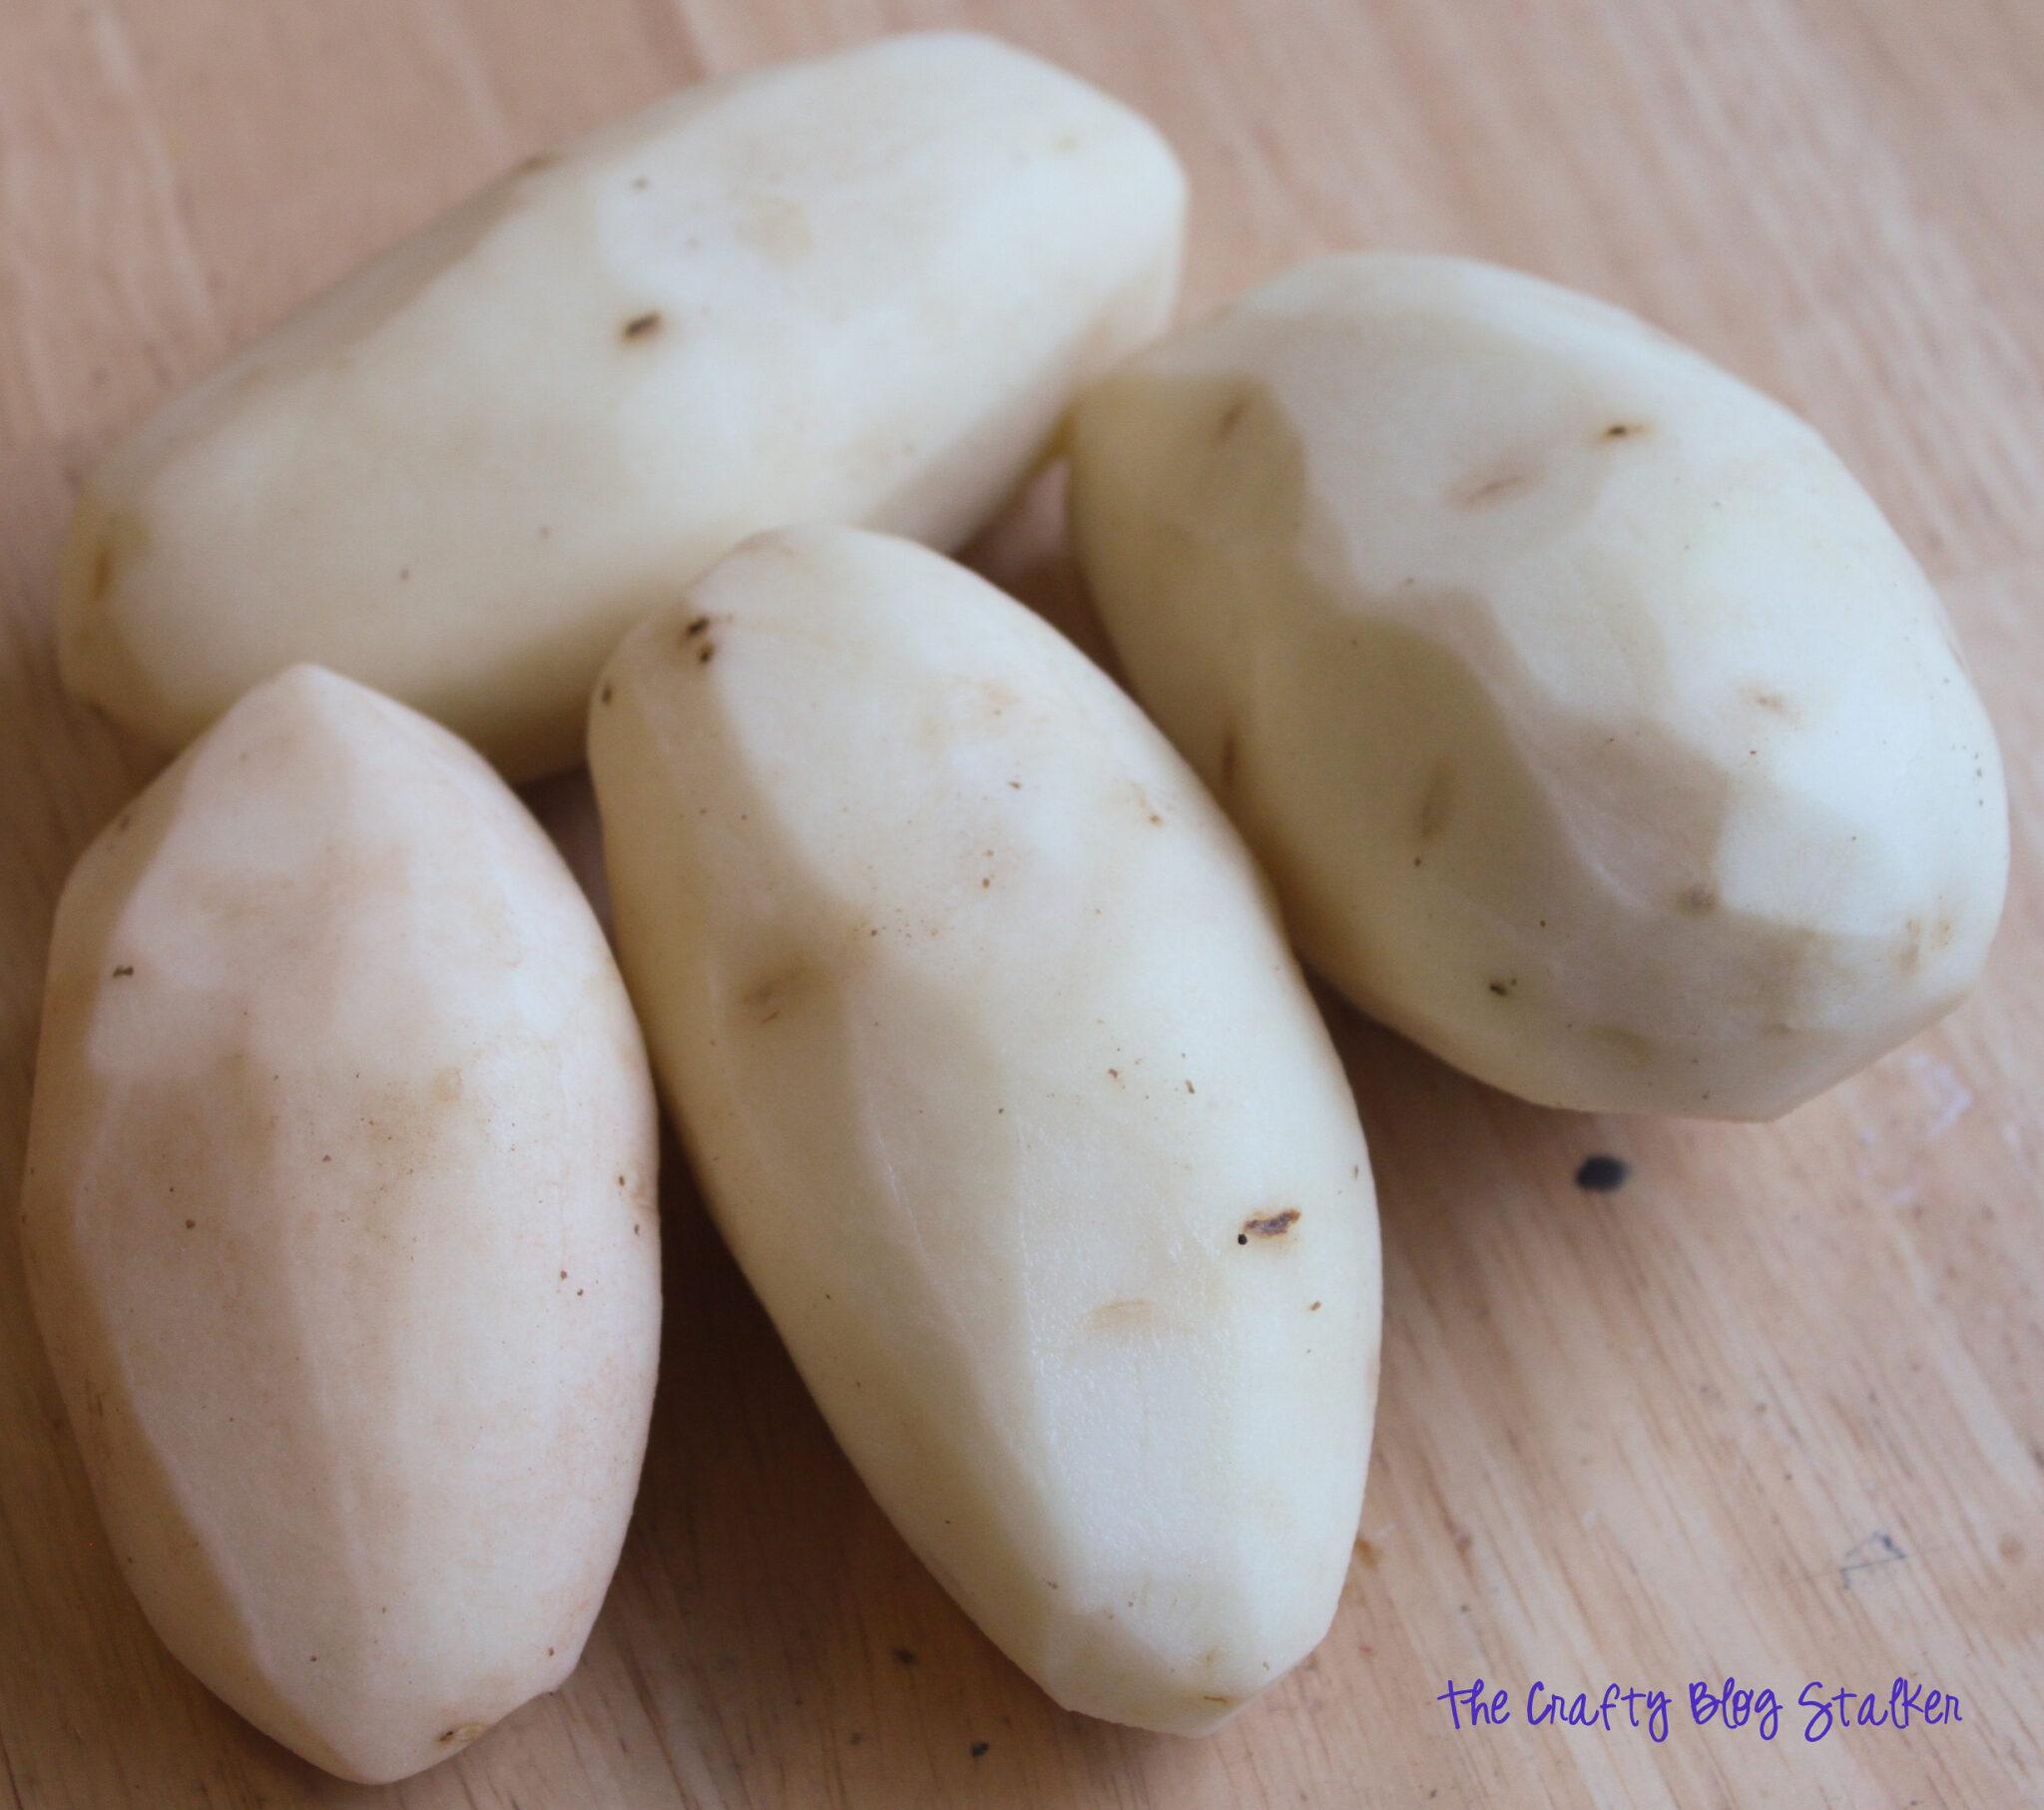 image of peeled potatoes